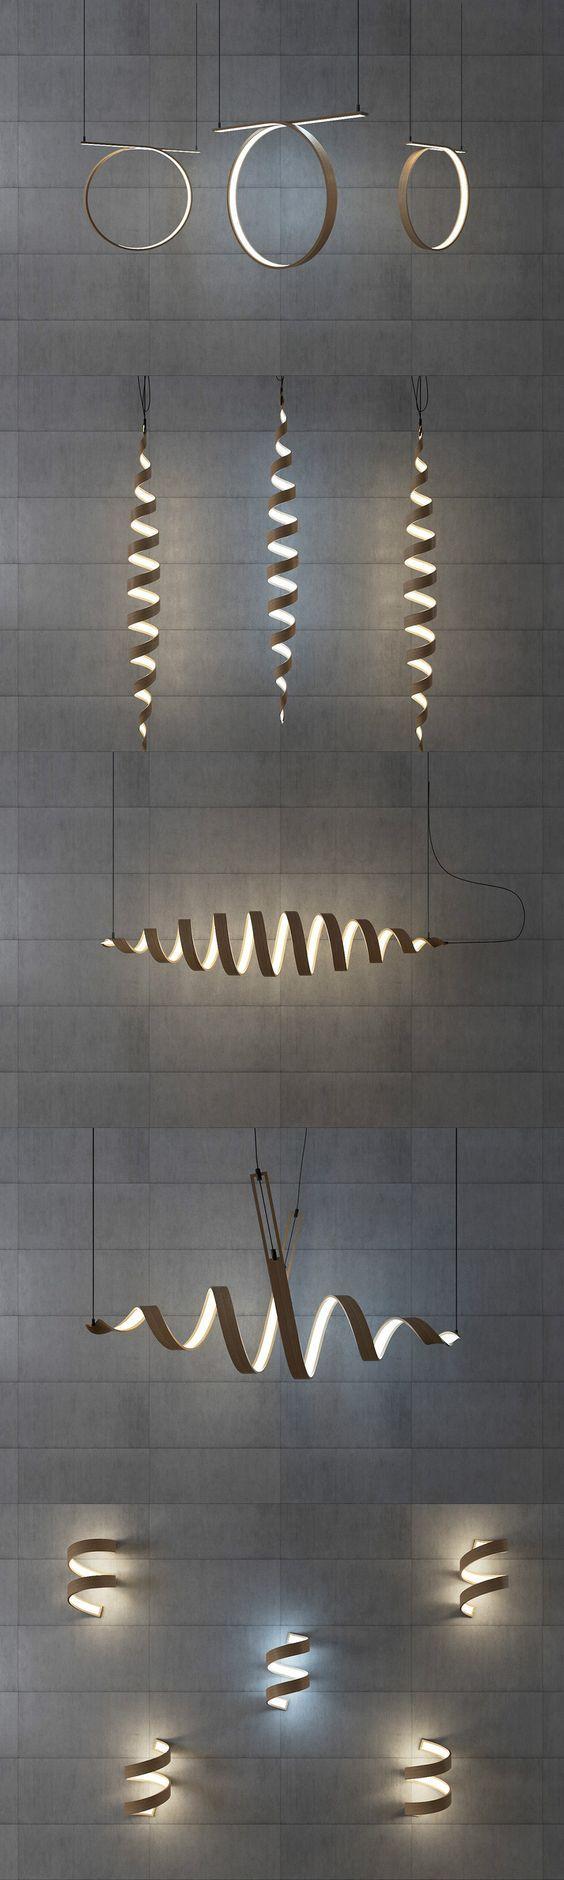 Twist lamps by Andrii Kovalskyi Photo:   yankodesign.com